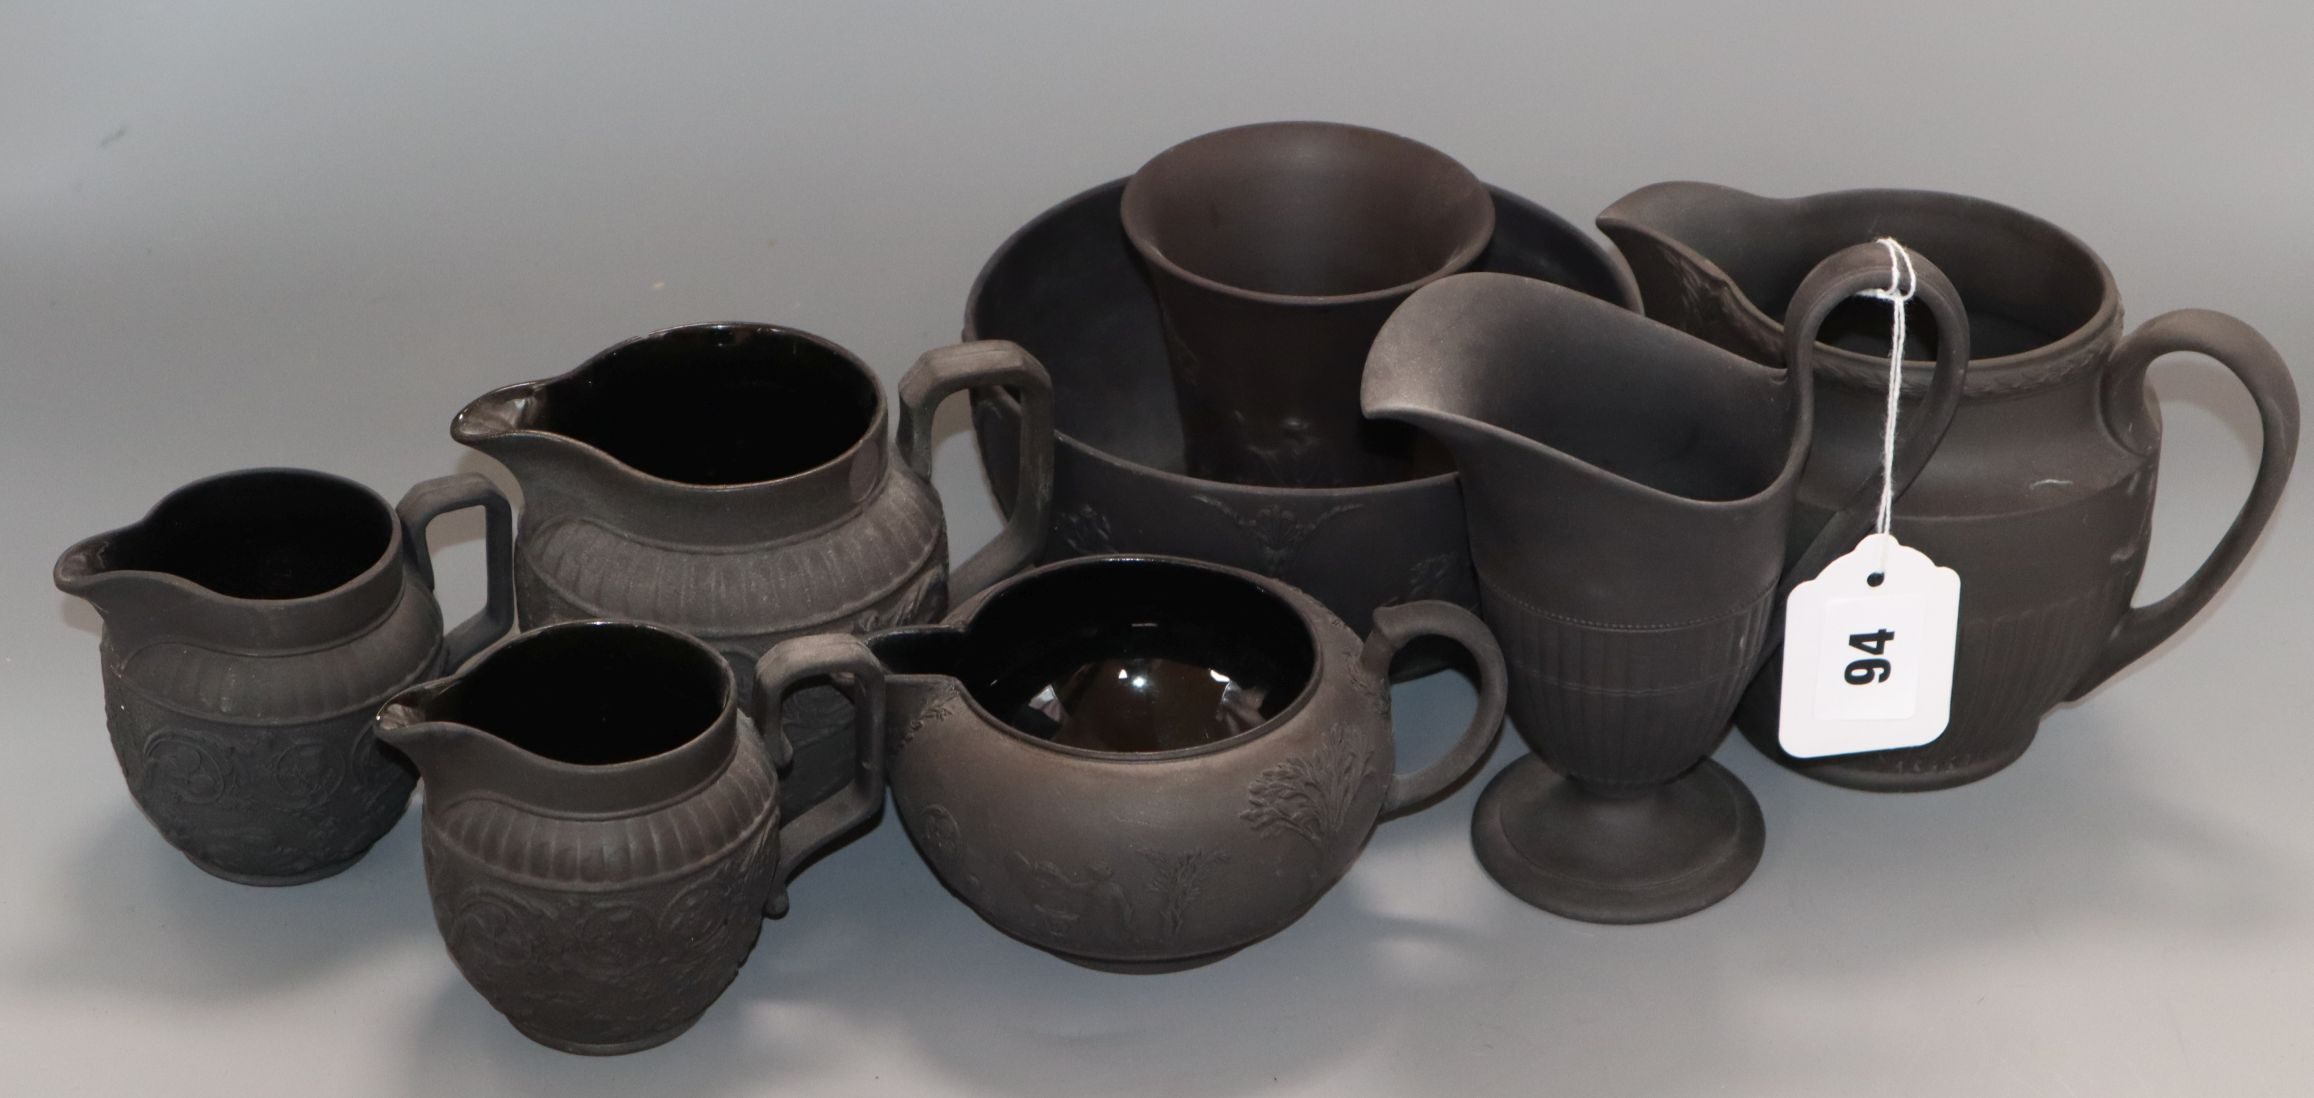 Lot 94 - A group of Wedgwood basalt tea wares